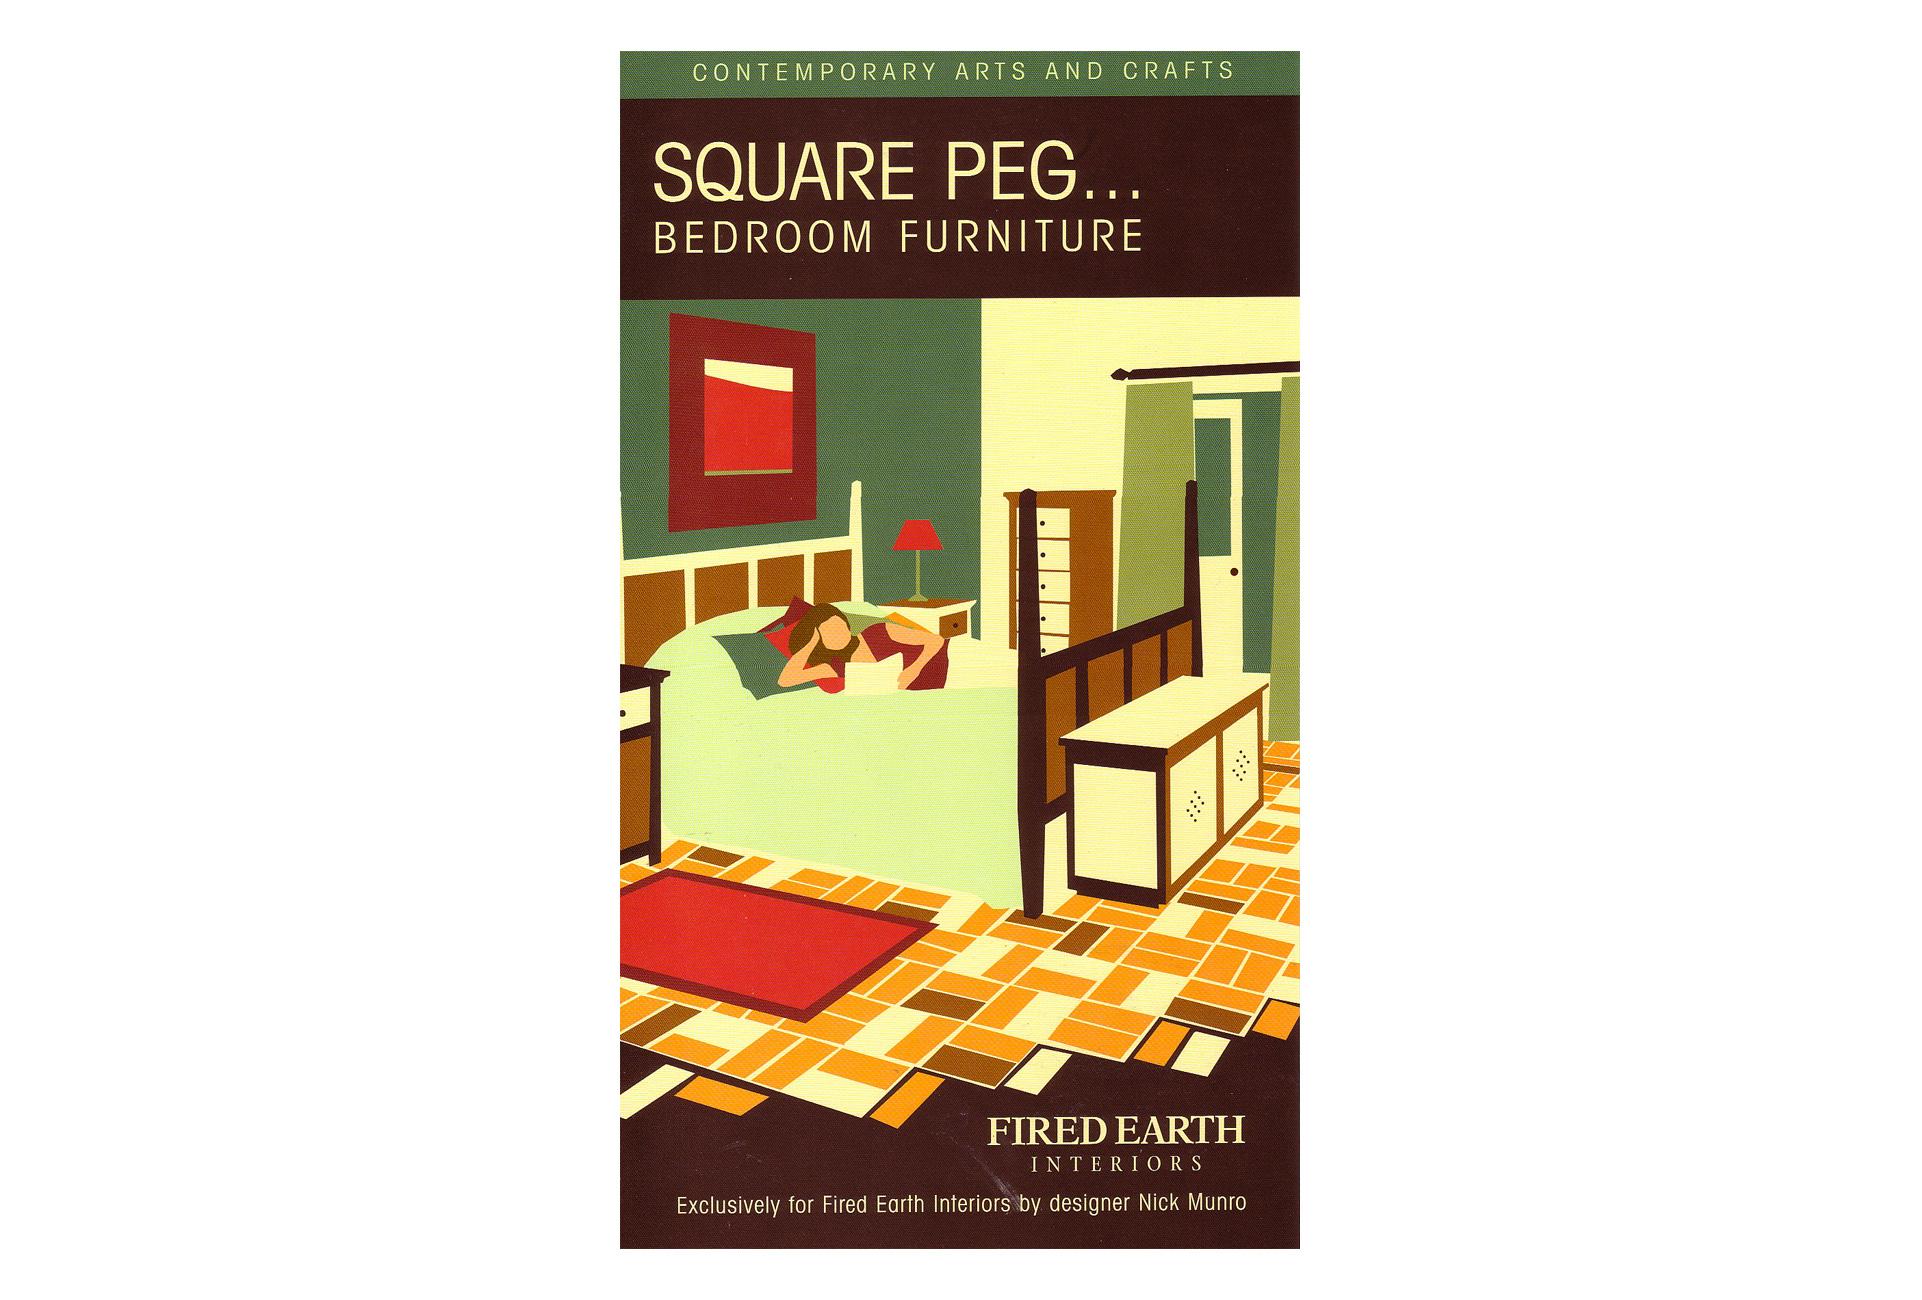 square_peg_furniture_ad